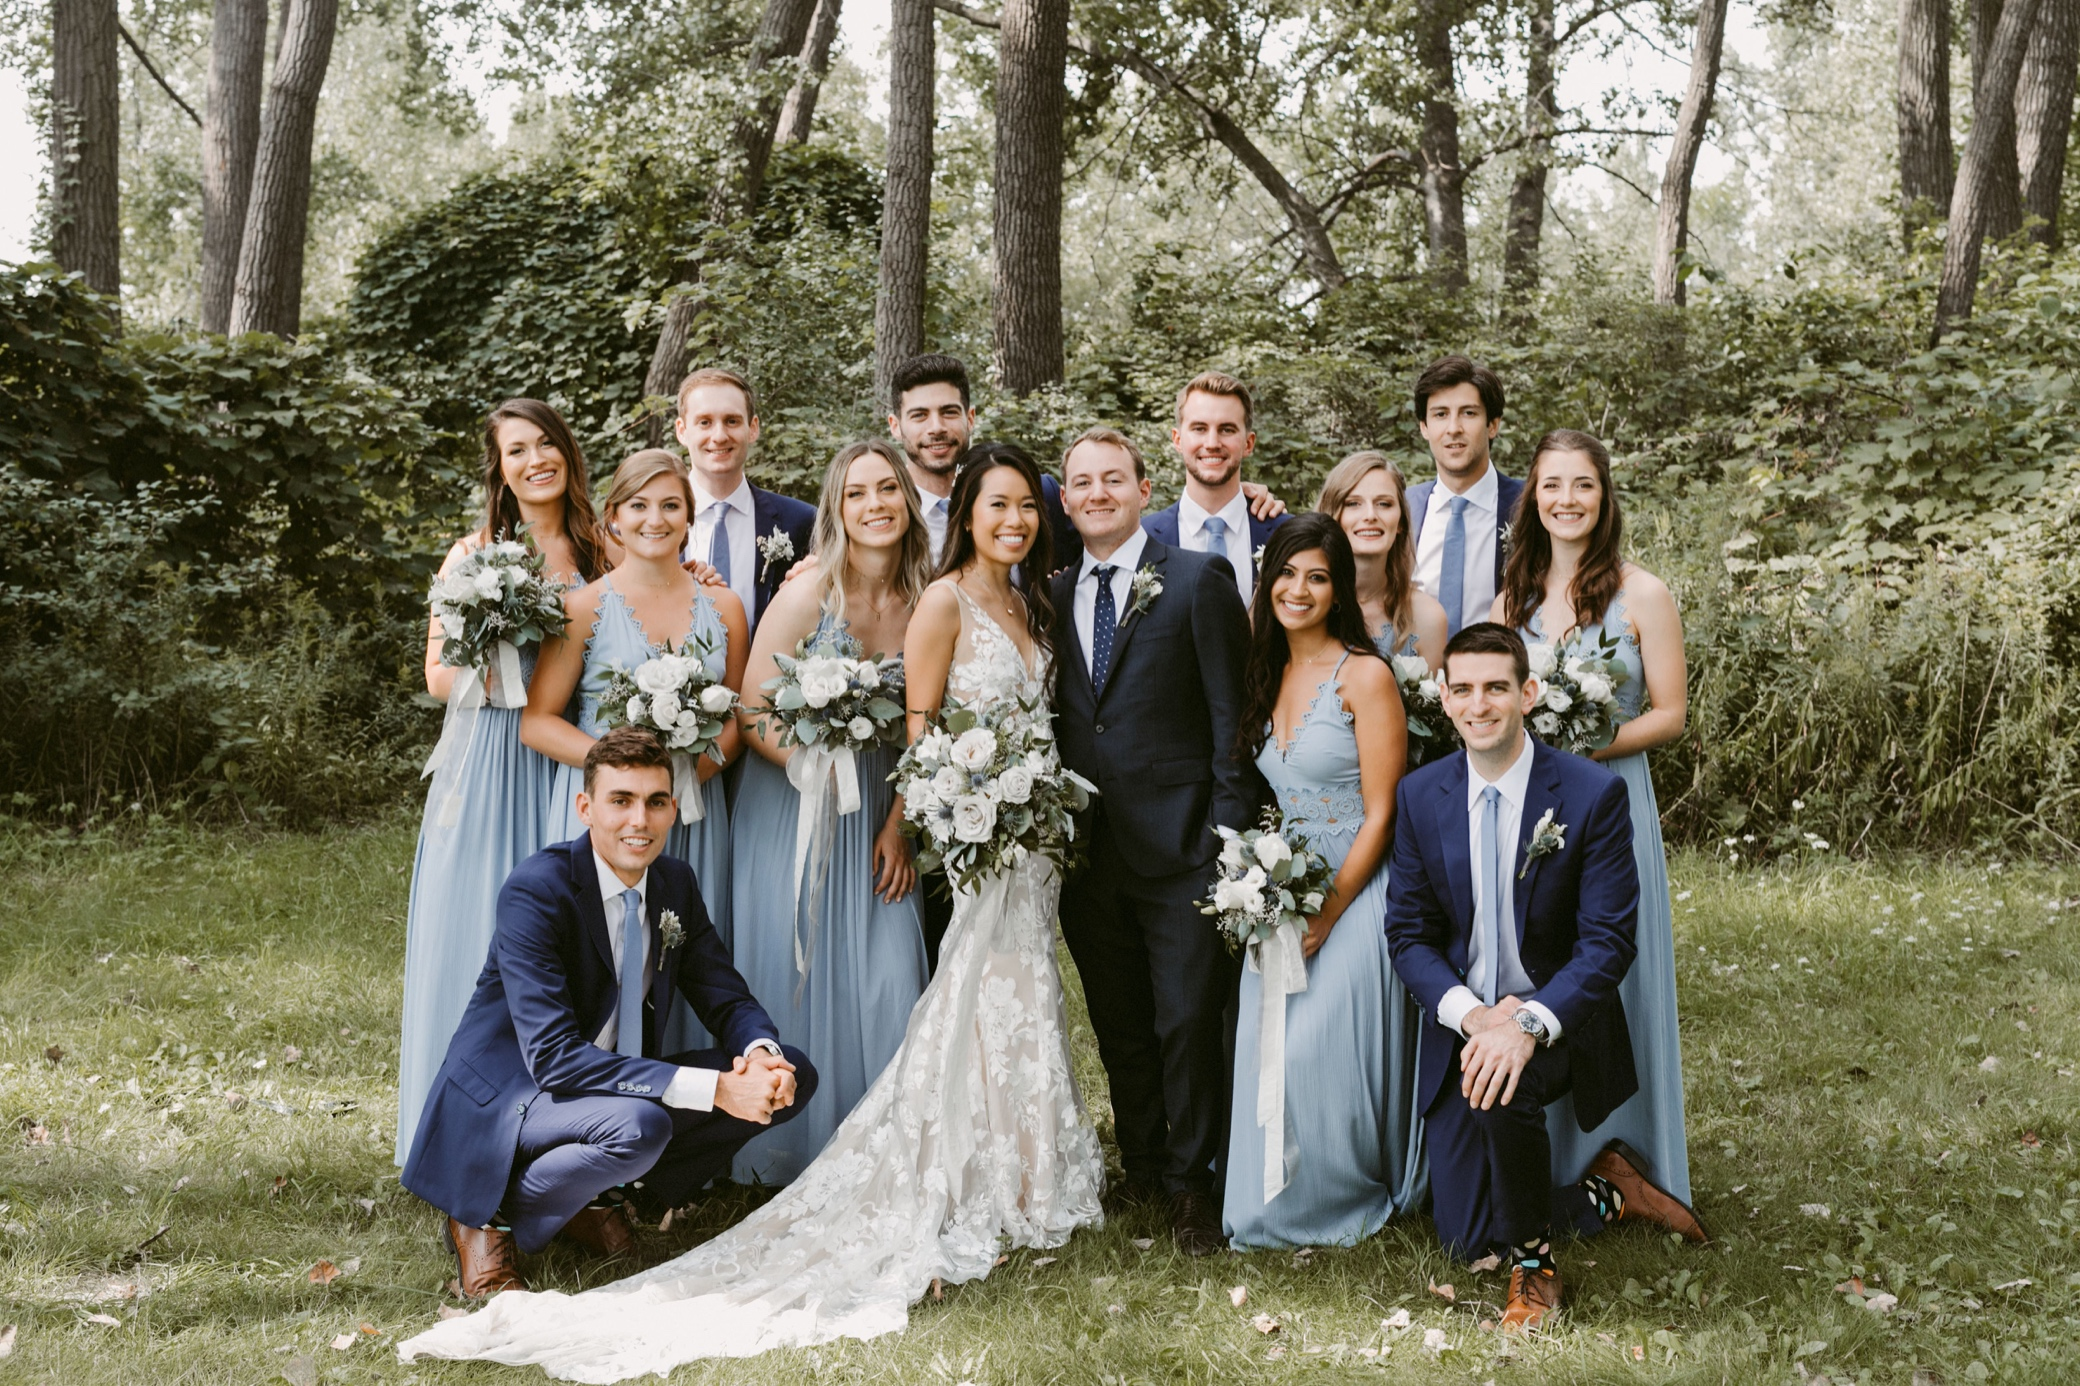 044_The Broadview Hotel Wedding (233 of 913).jpg